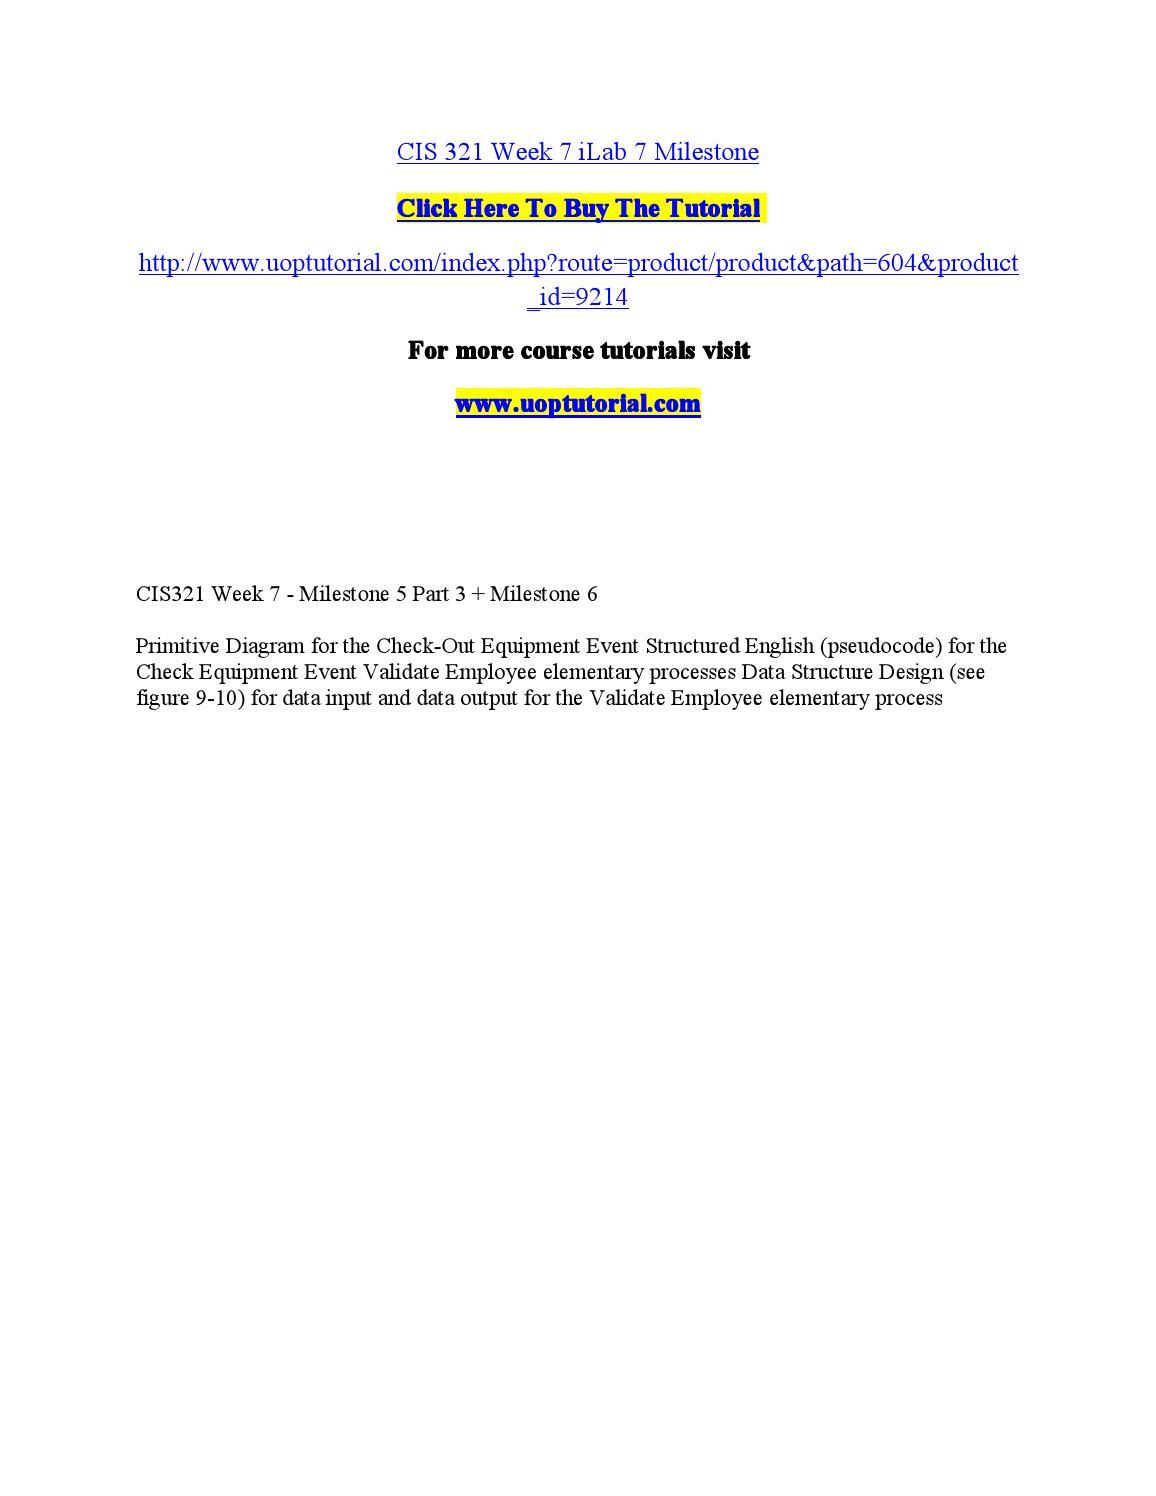 CIS 515 Assignment 3: University Database